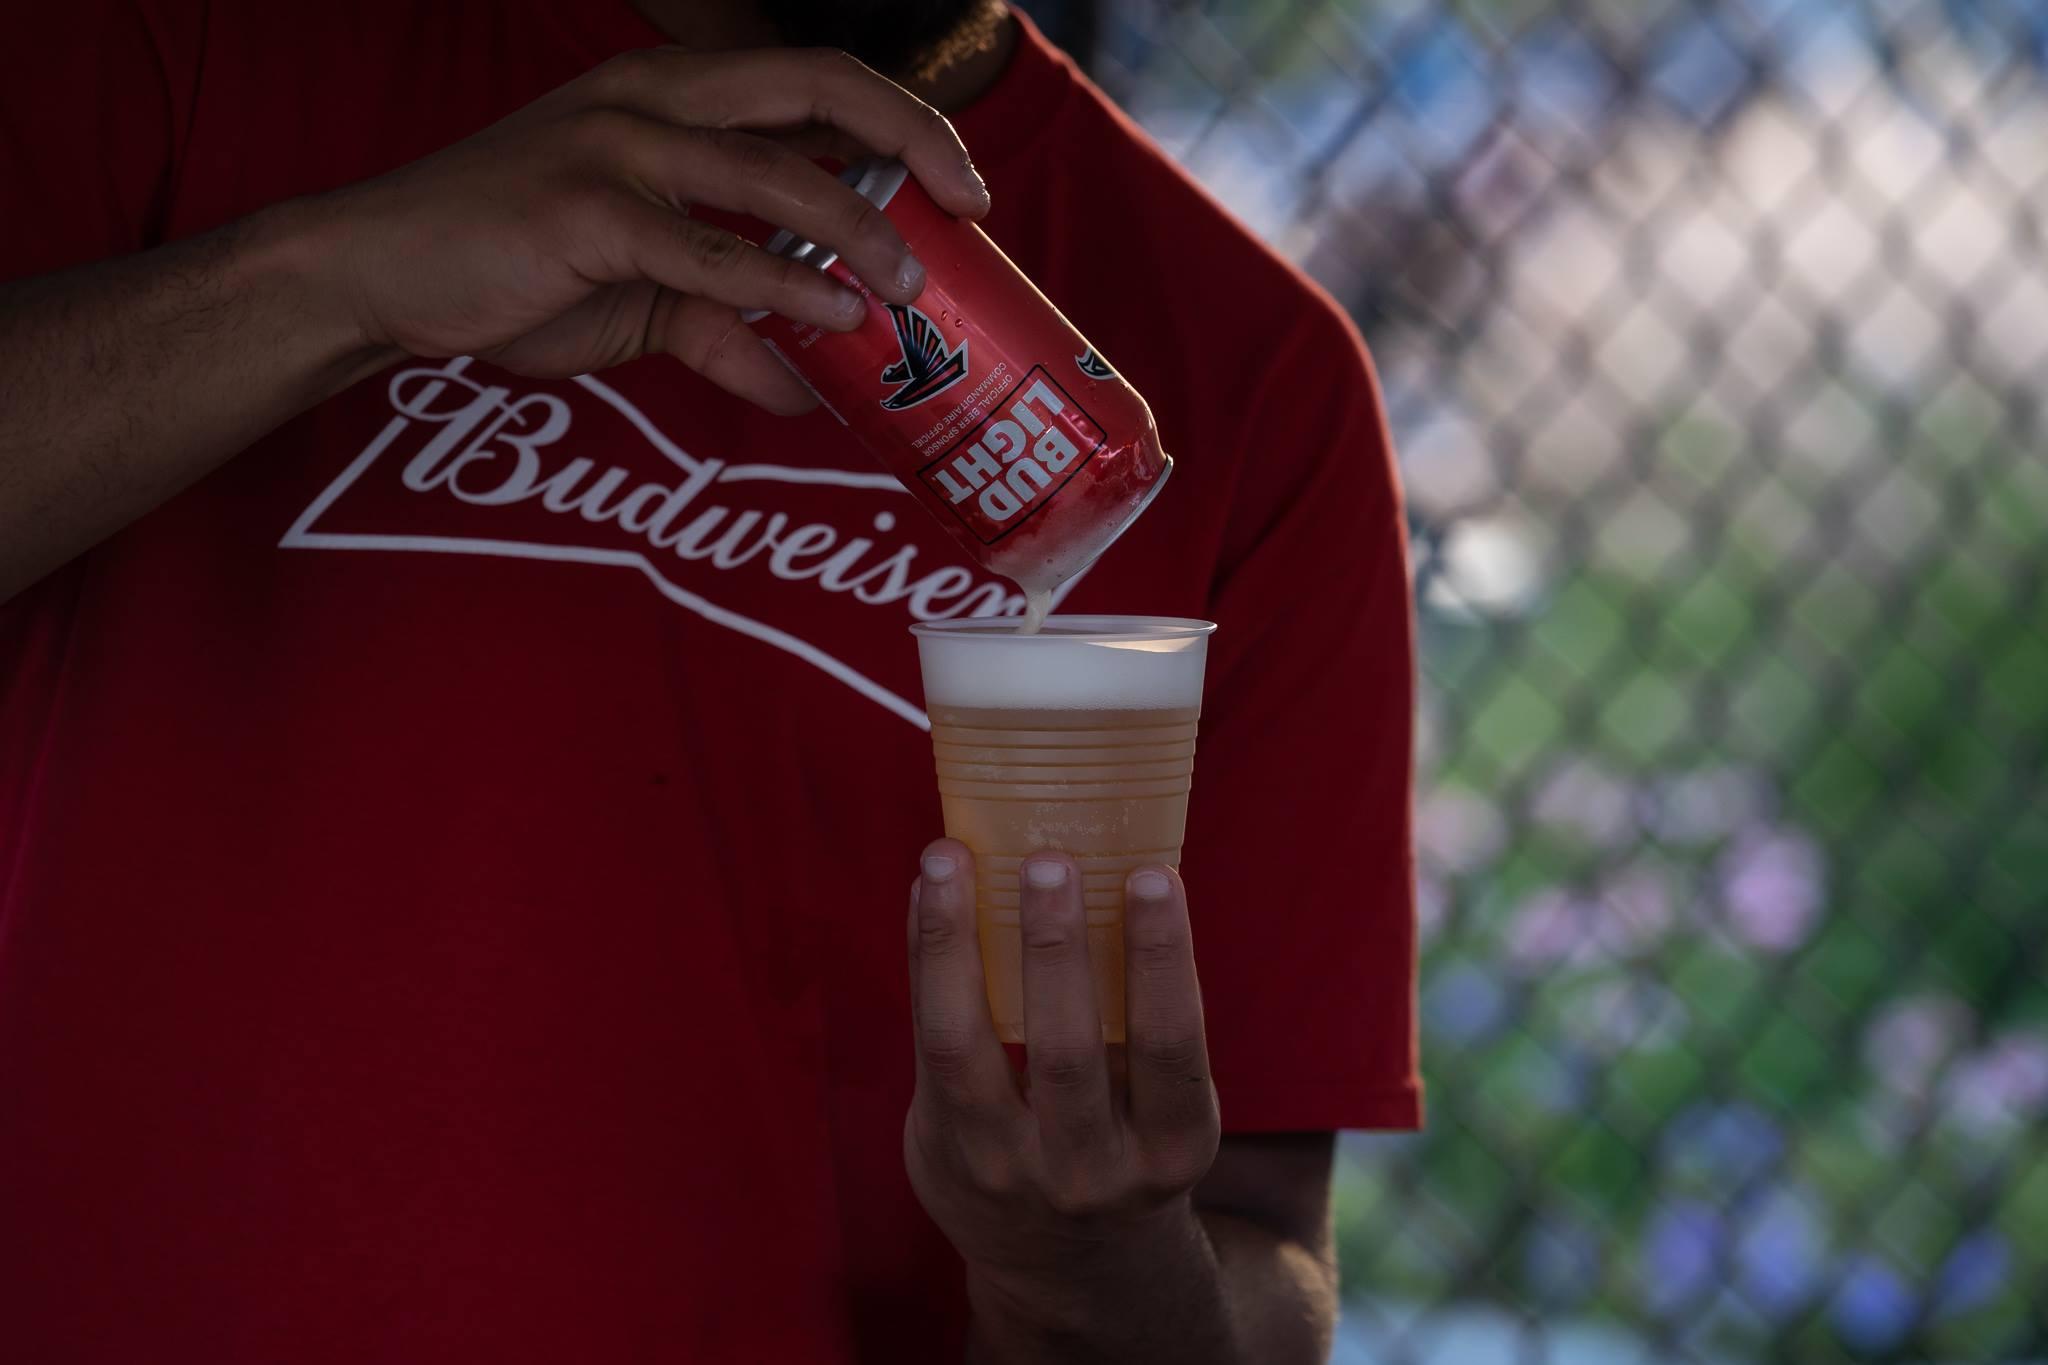 sponsored by Budweiser